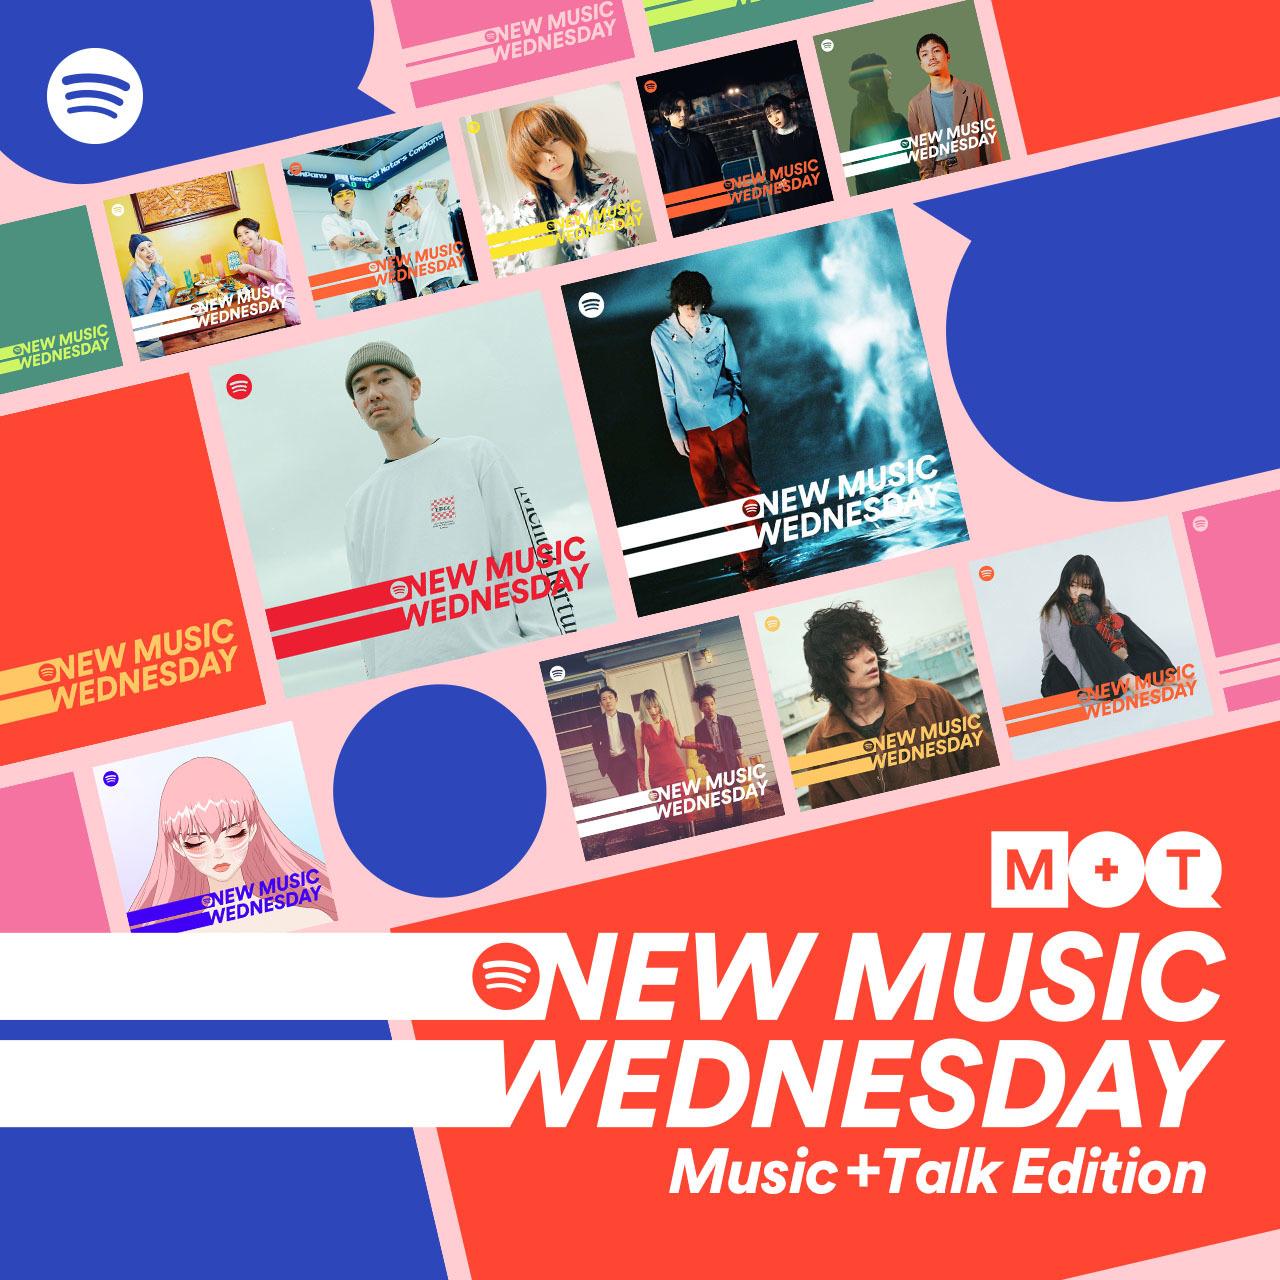 SPICEのNew Music Wednesday [Music+Talk Edition]の記事の一覧です